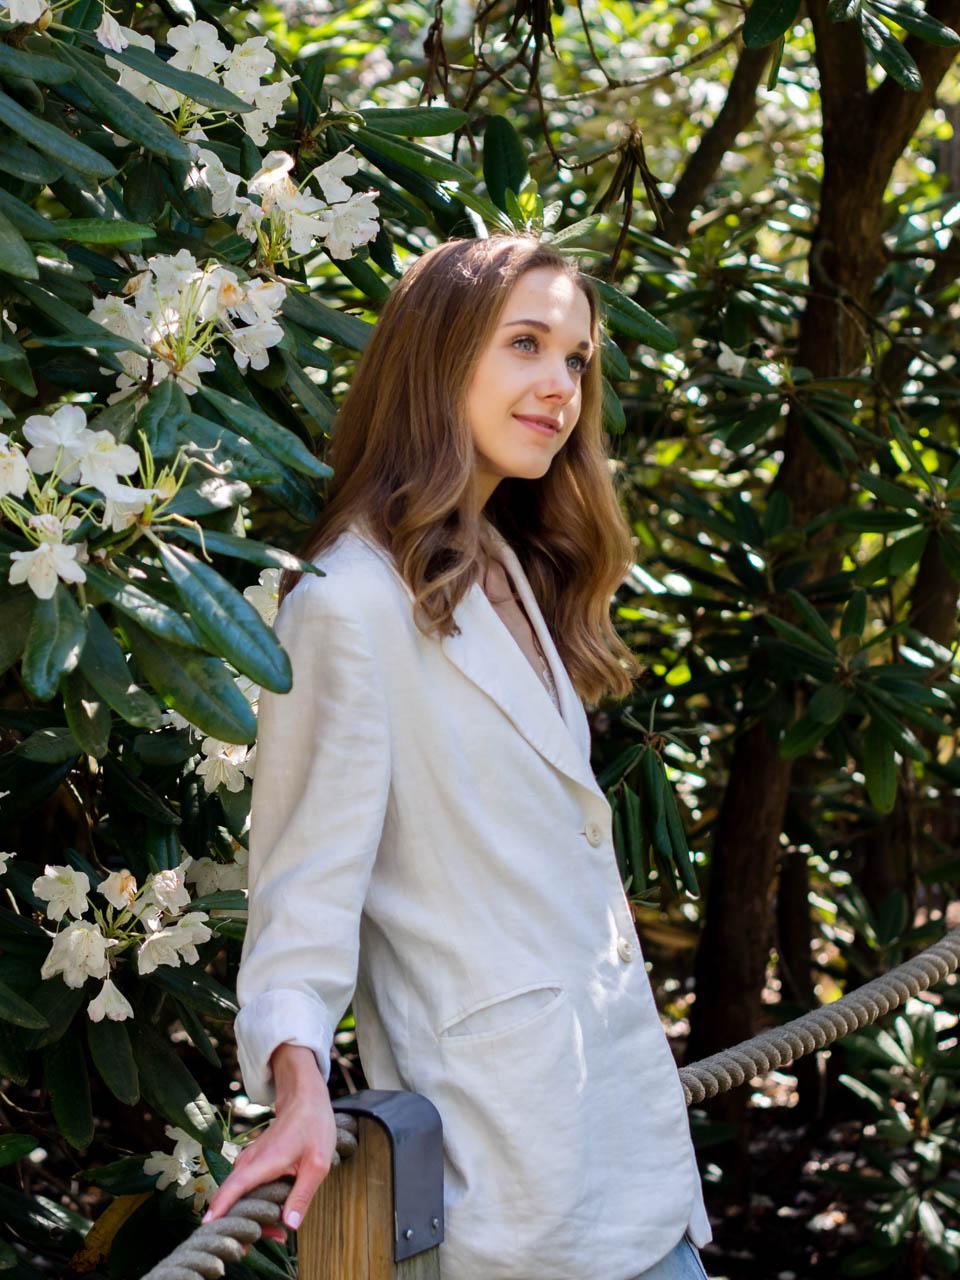 minimal-scandinavia-style-fashion-blogger-summer-outfit-inspiration